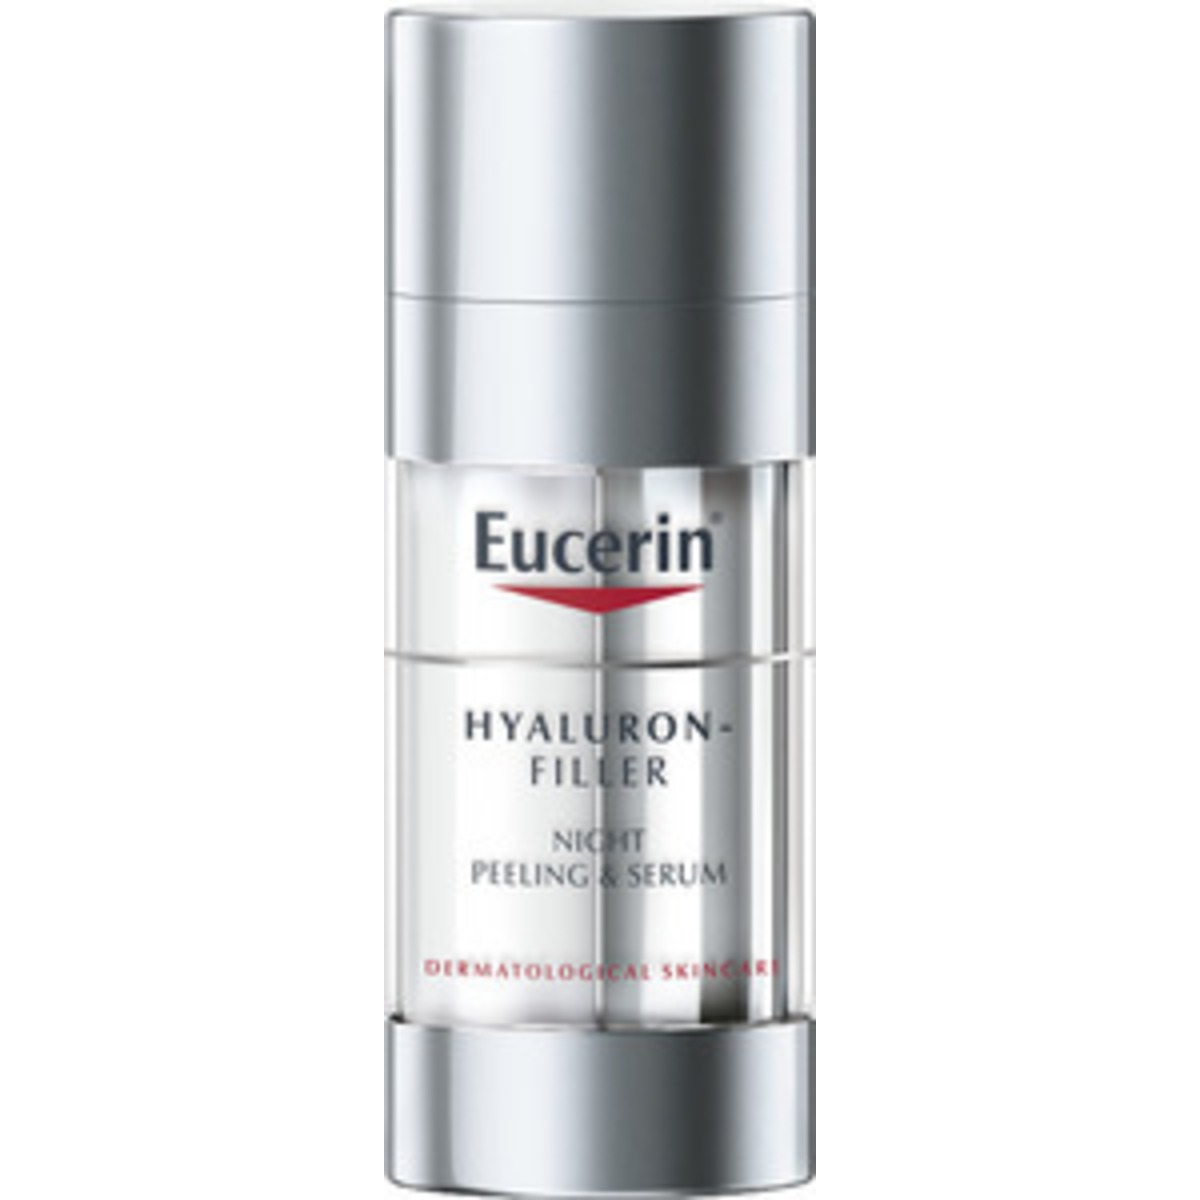 Eucerin Hyaluron Filler Night Peeling & Serum – 30 ml